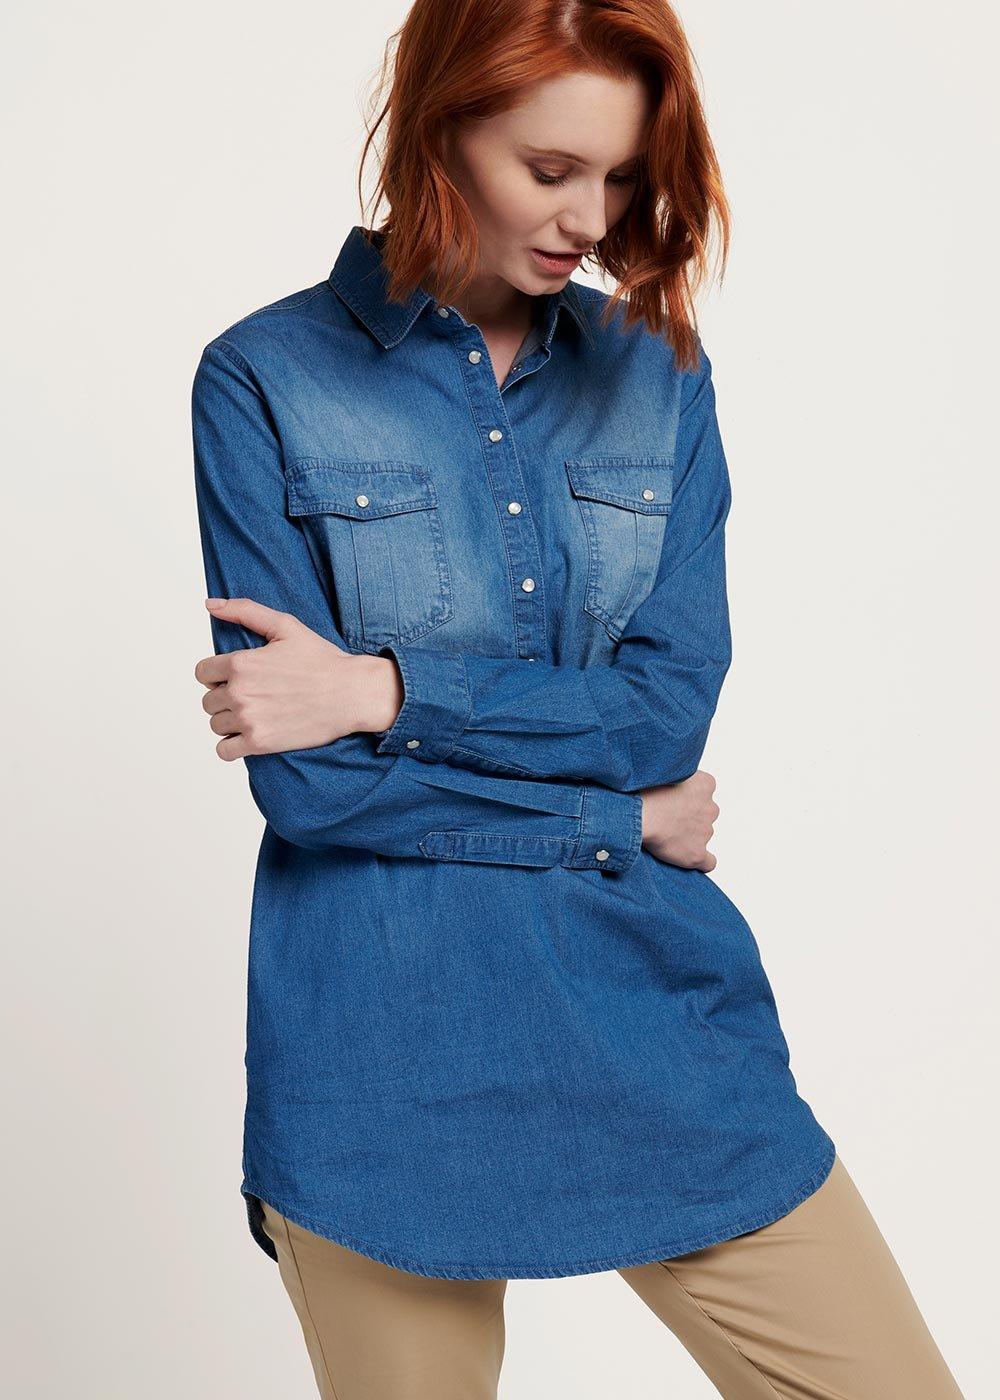 Cassy denim shirt - Denim - Woman